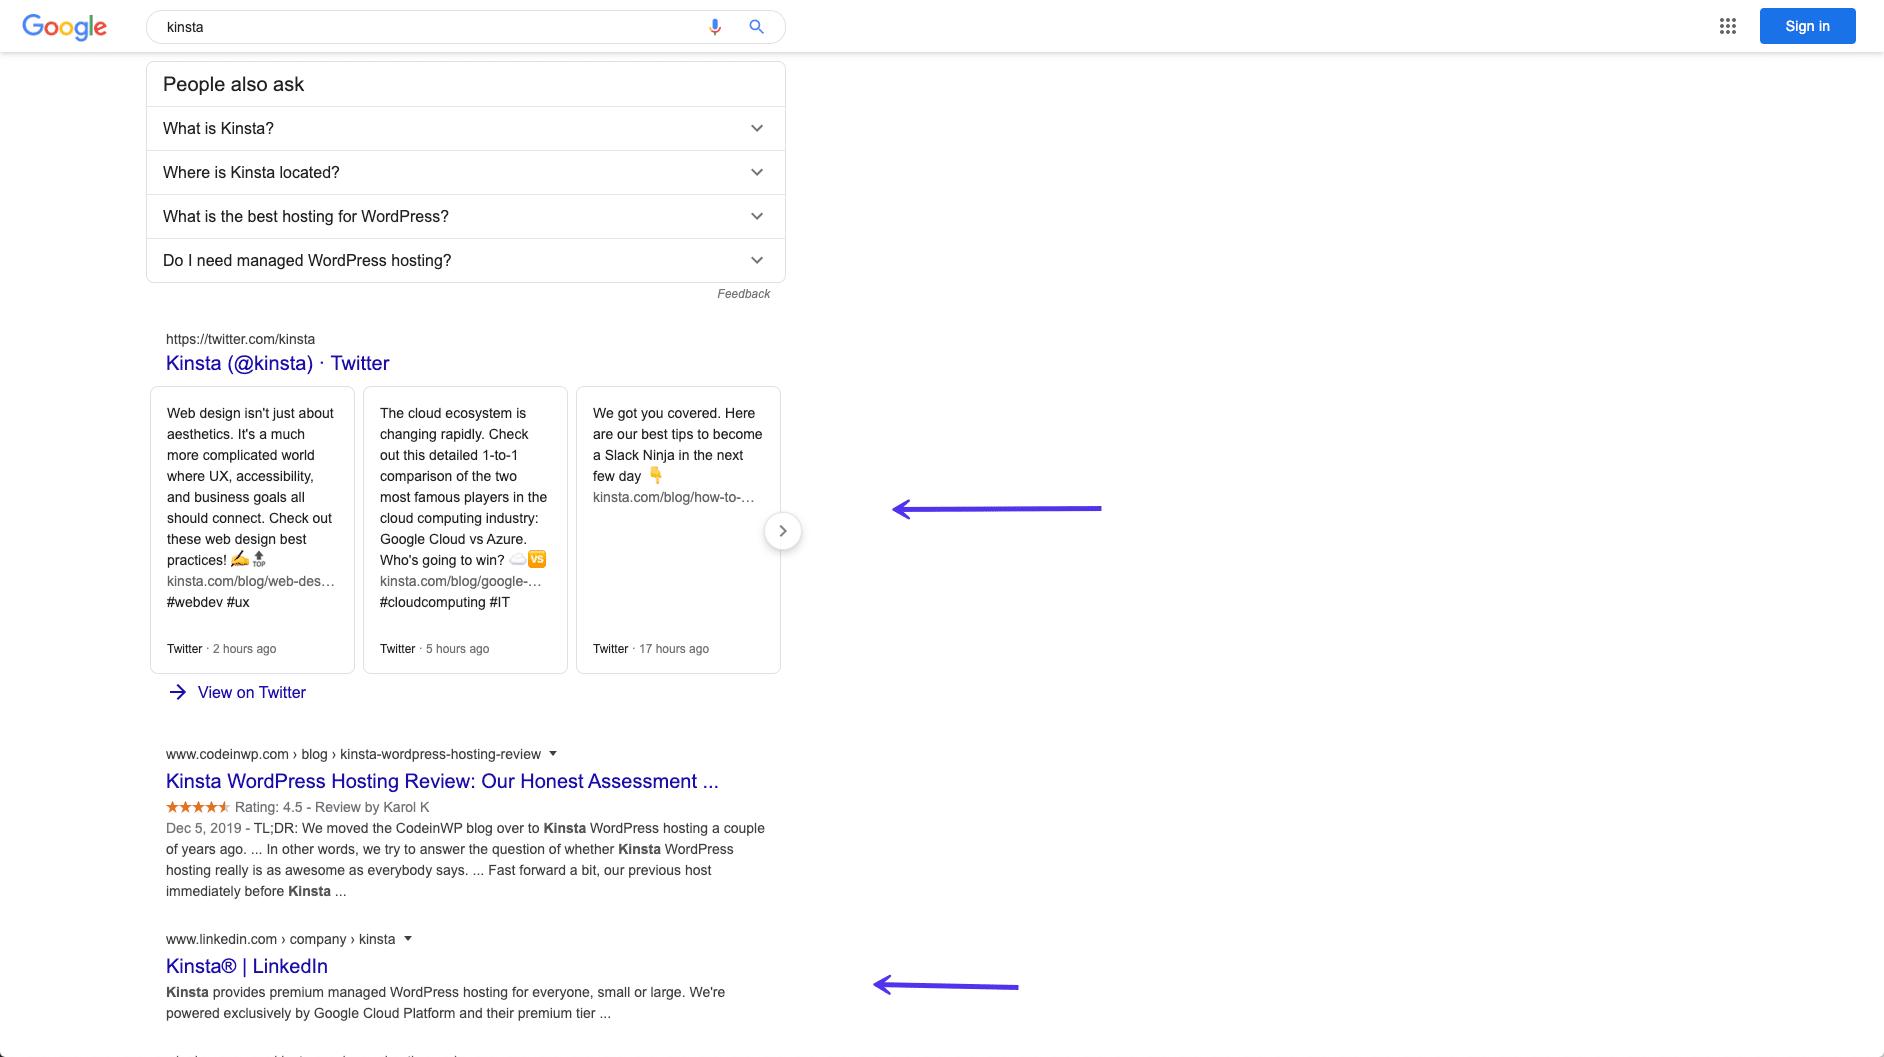 De social media profielen ranking van Kinsta in Google